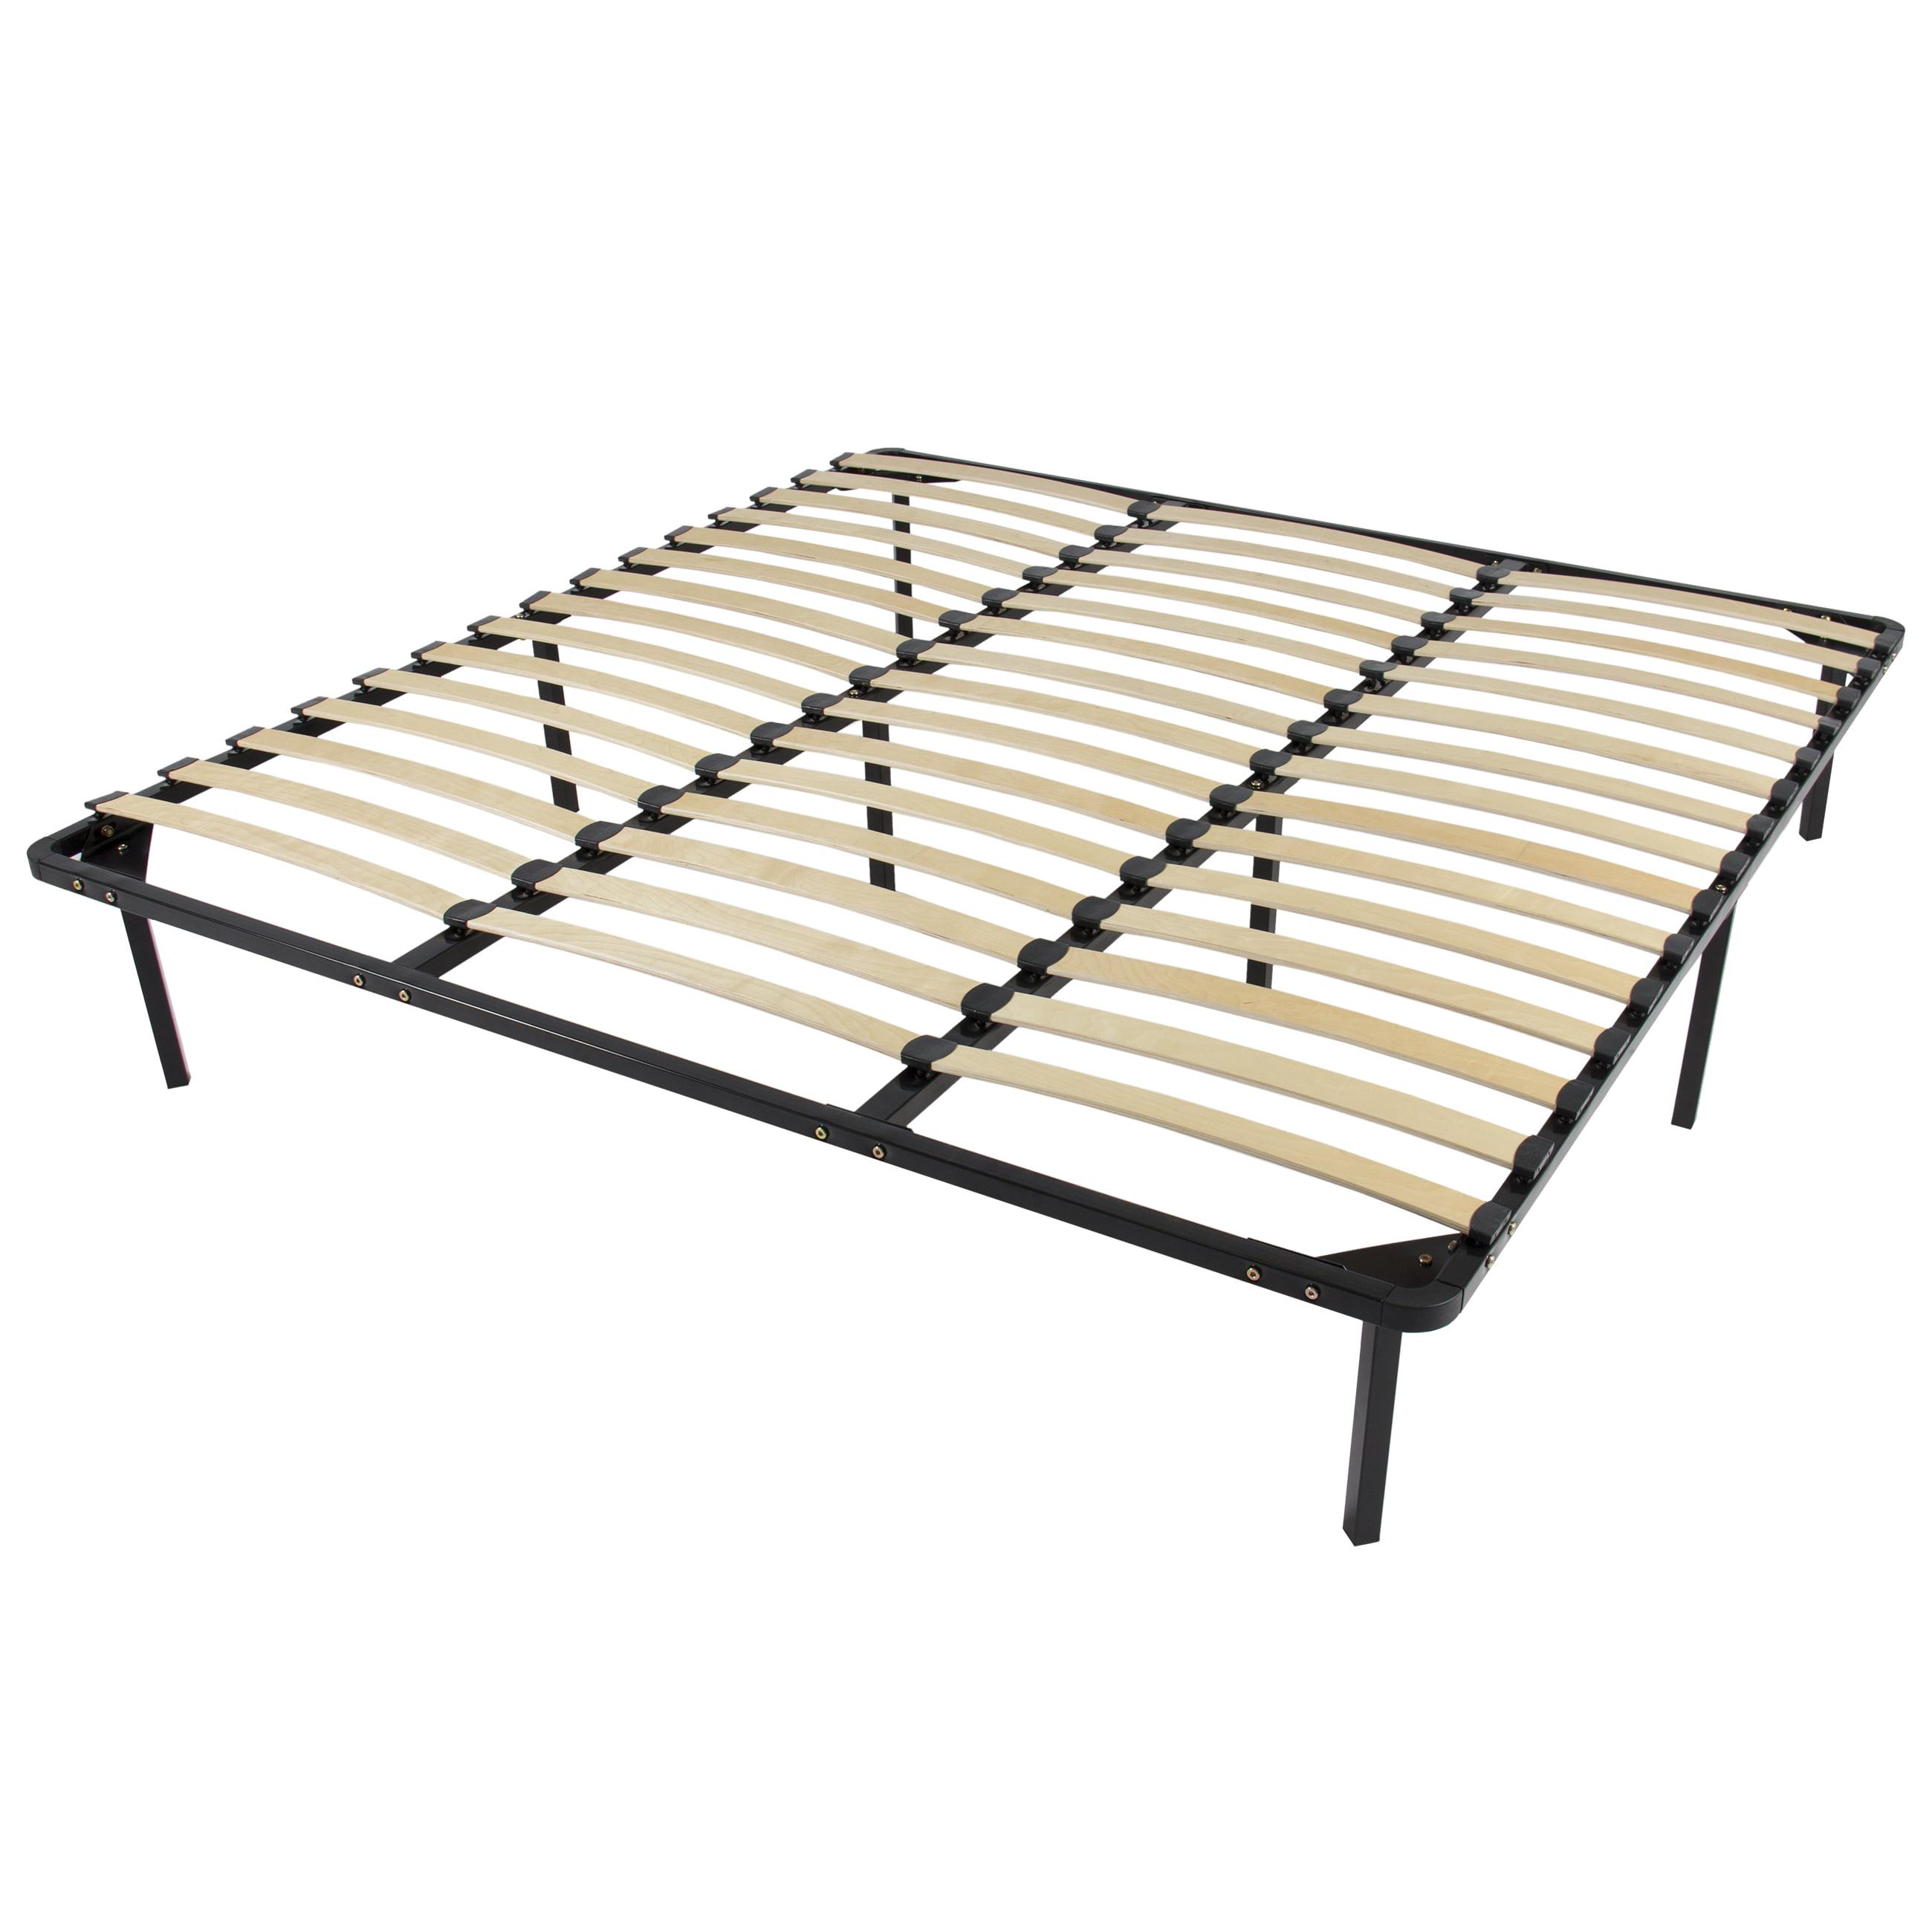 Best Choice Products King Size Wooden Slat Metal Bed Frame Wood Platform Bedroom Mattress Foundation w/ Bottom Storage, No Box Spring Needed - Black